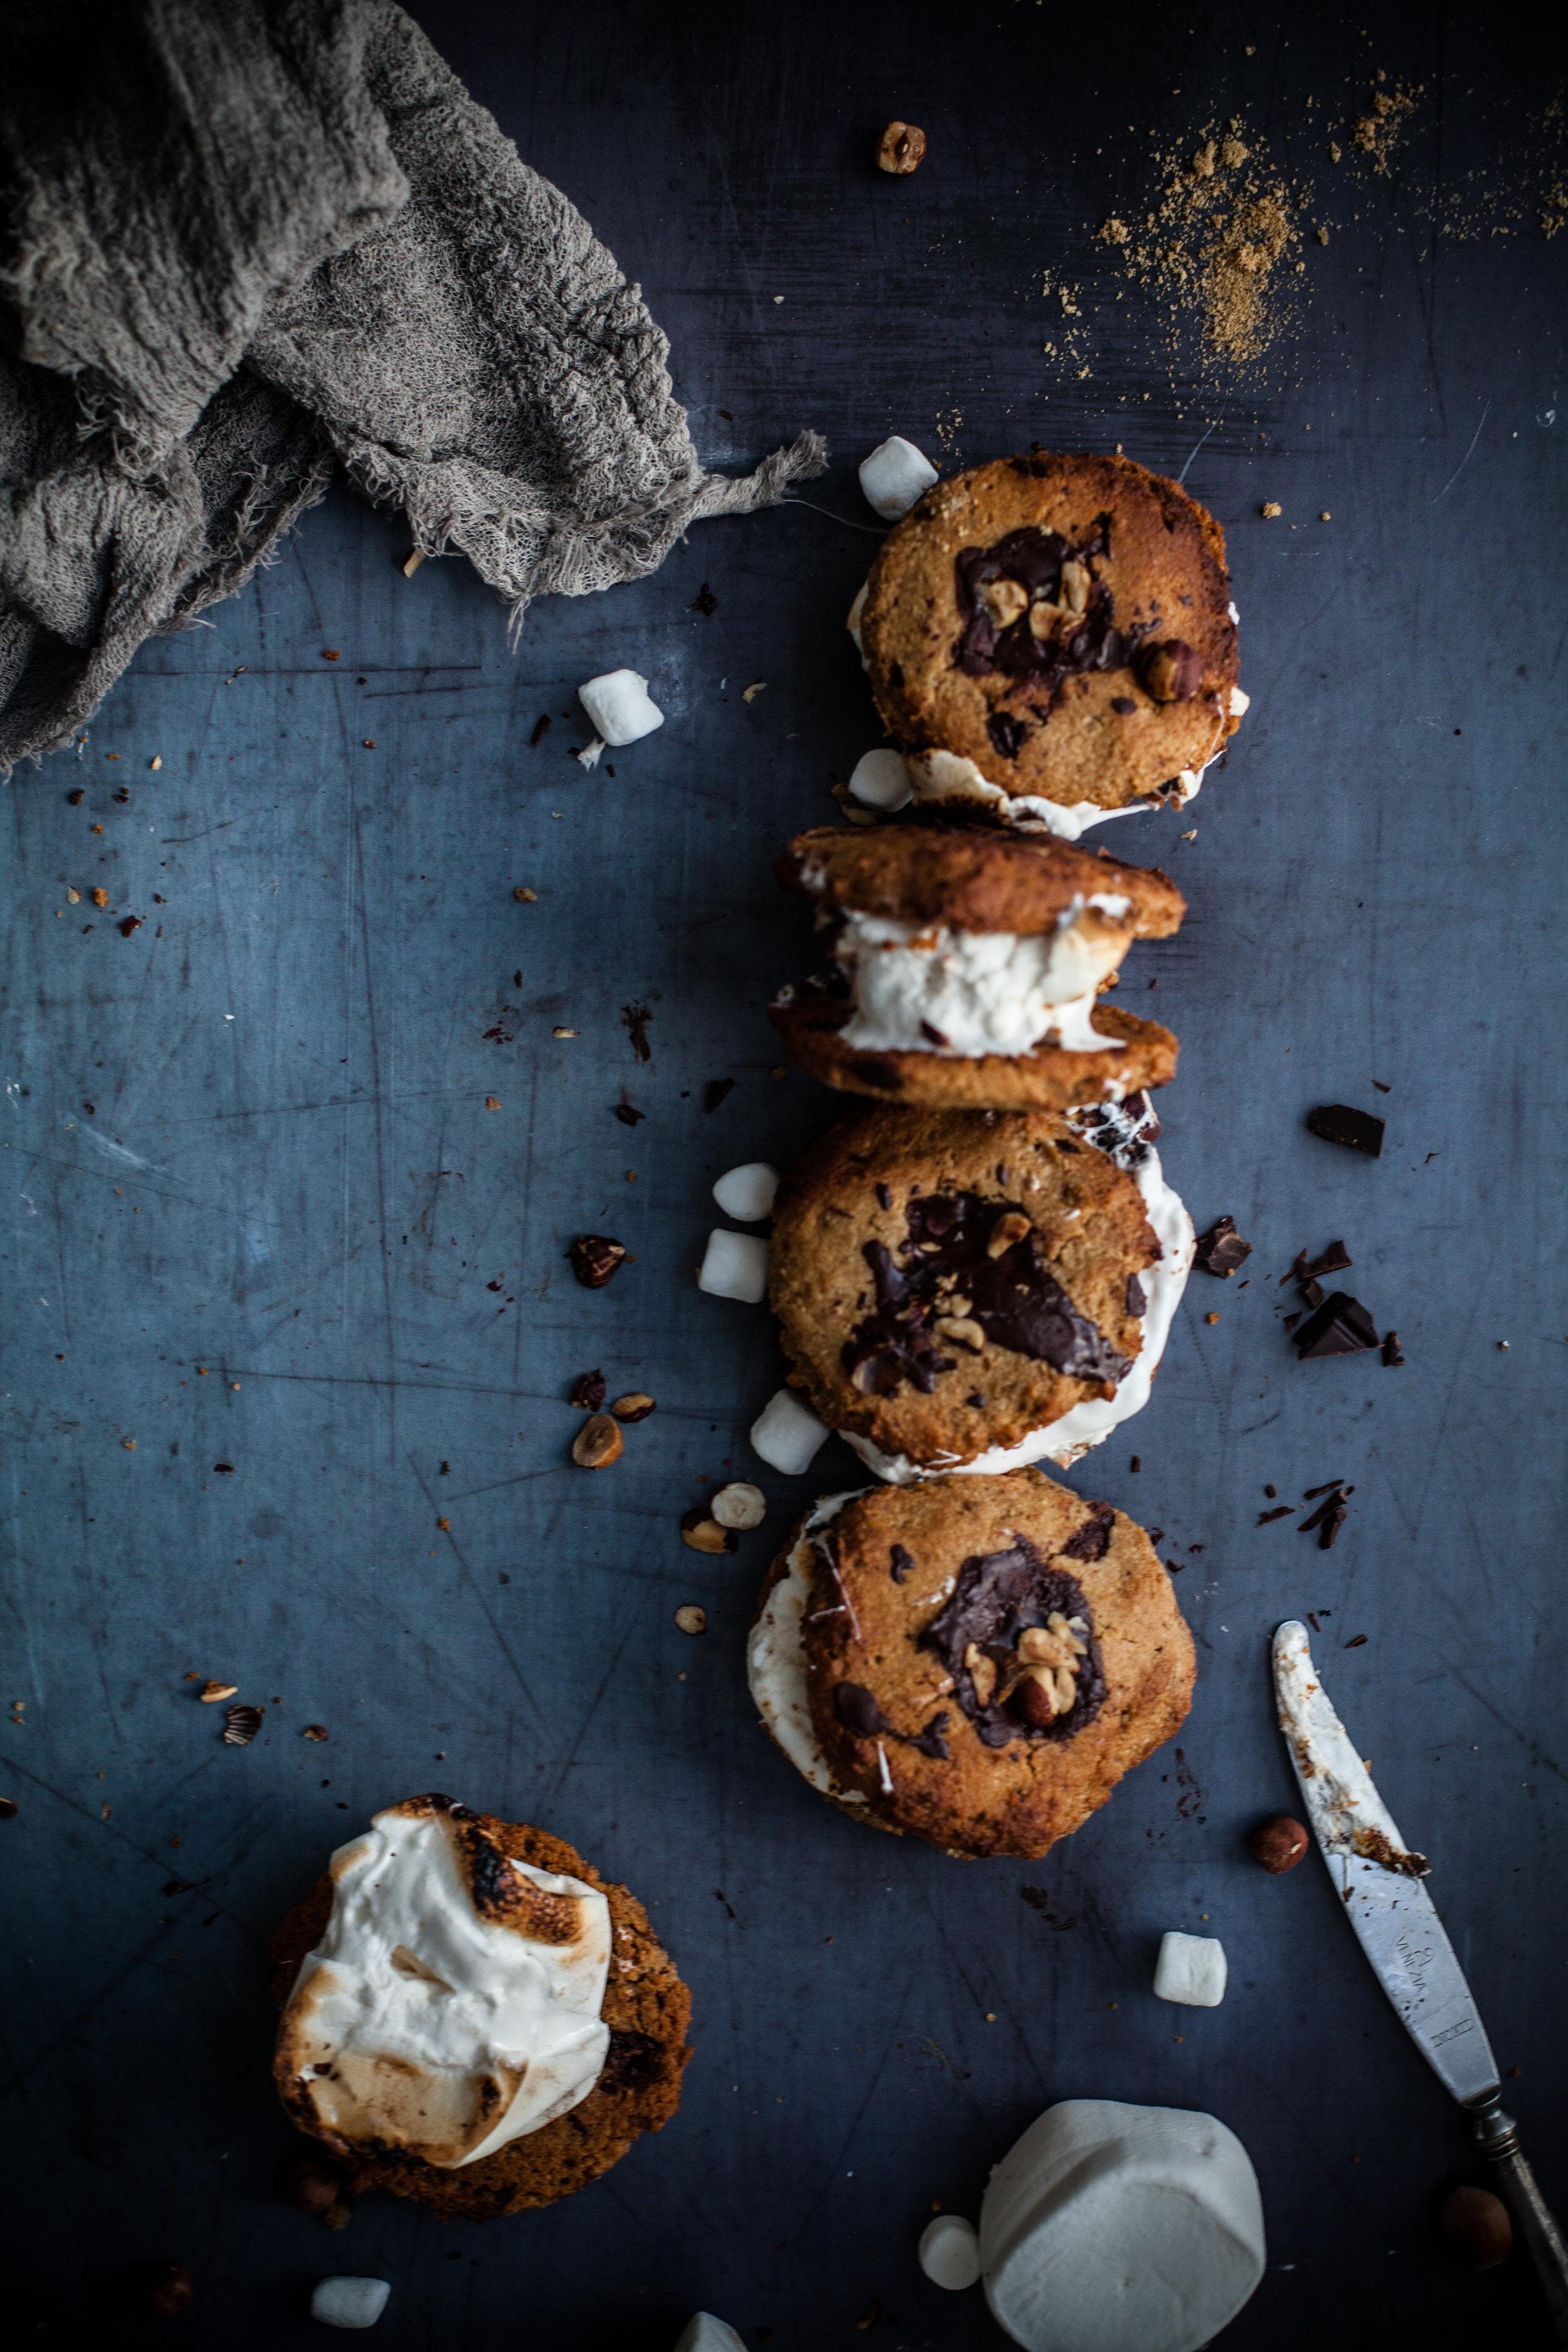 gooey choco chip cookies s'mores #glutenfree #vegan